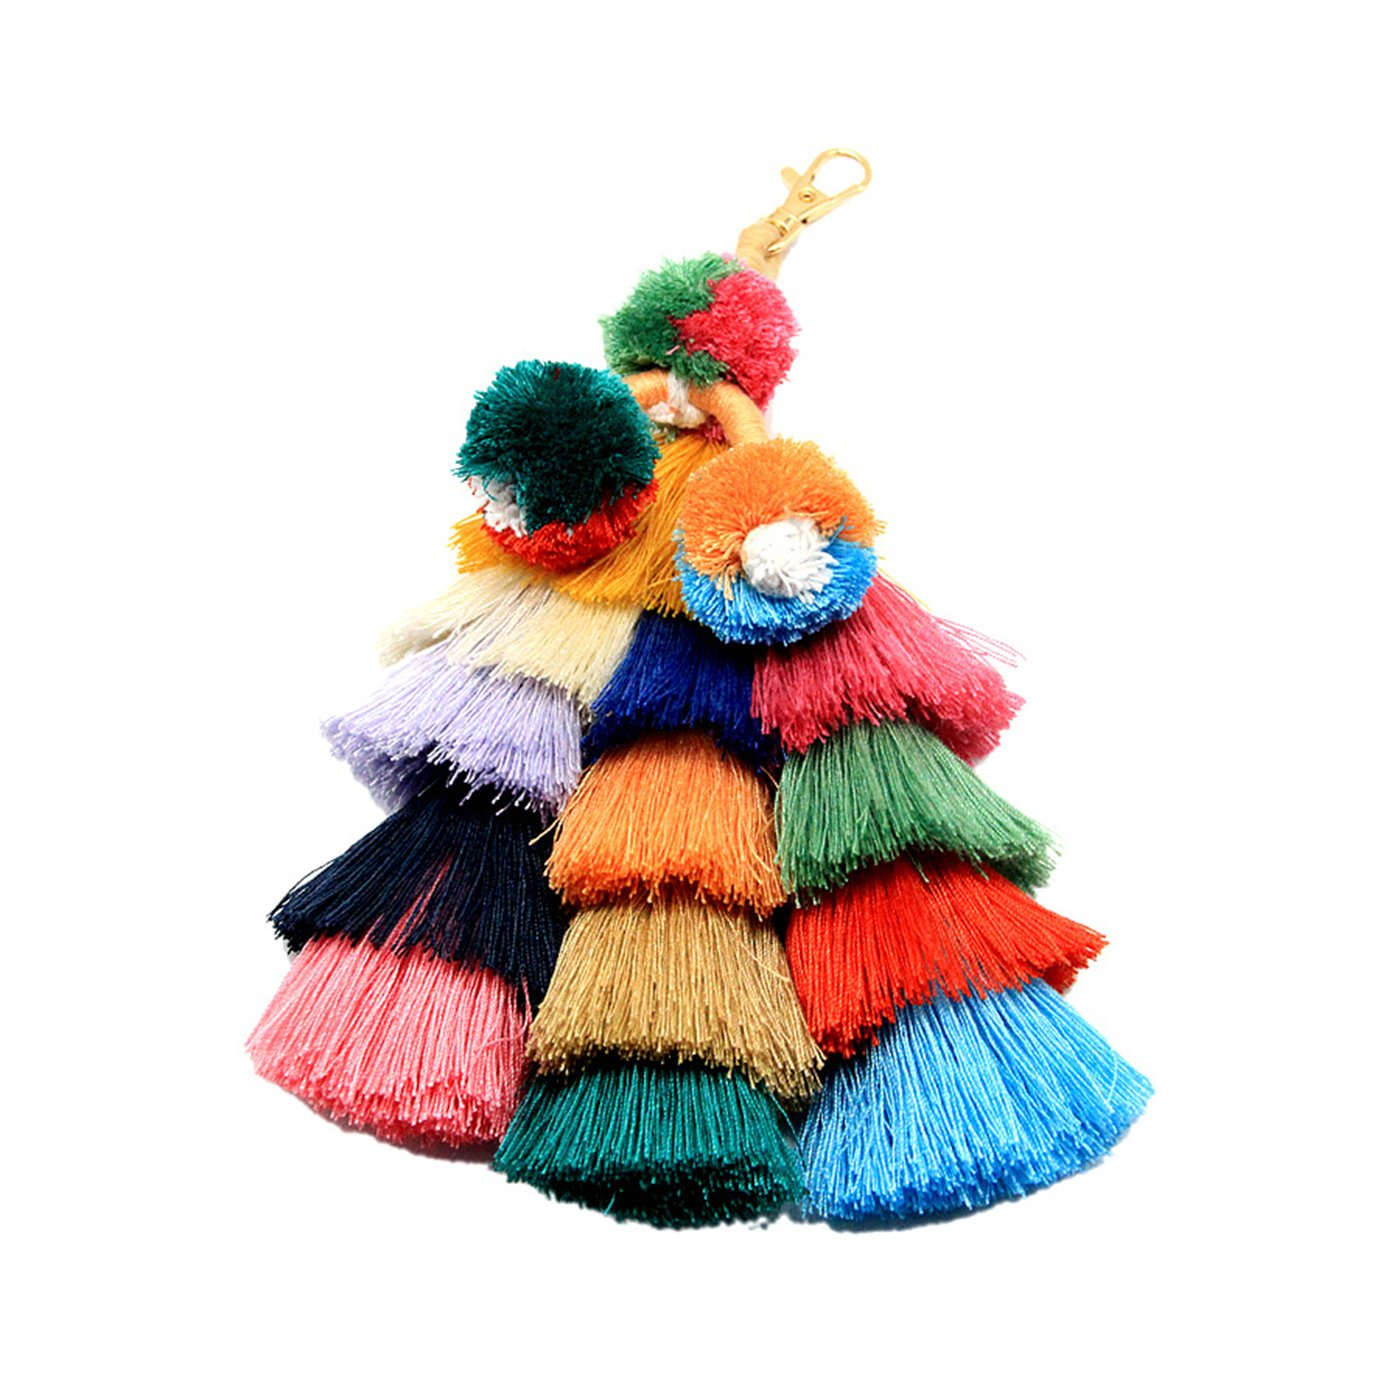 Colorful Bohemian Handmade Big Pompom Tassels Bag Pendant, Charm Keychain Car Accessories (K-002)